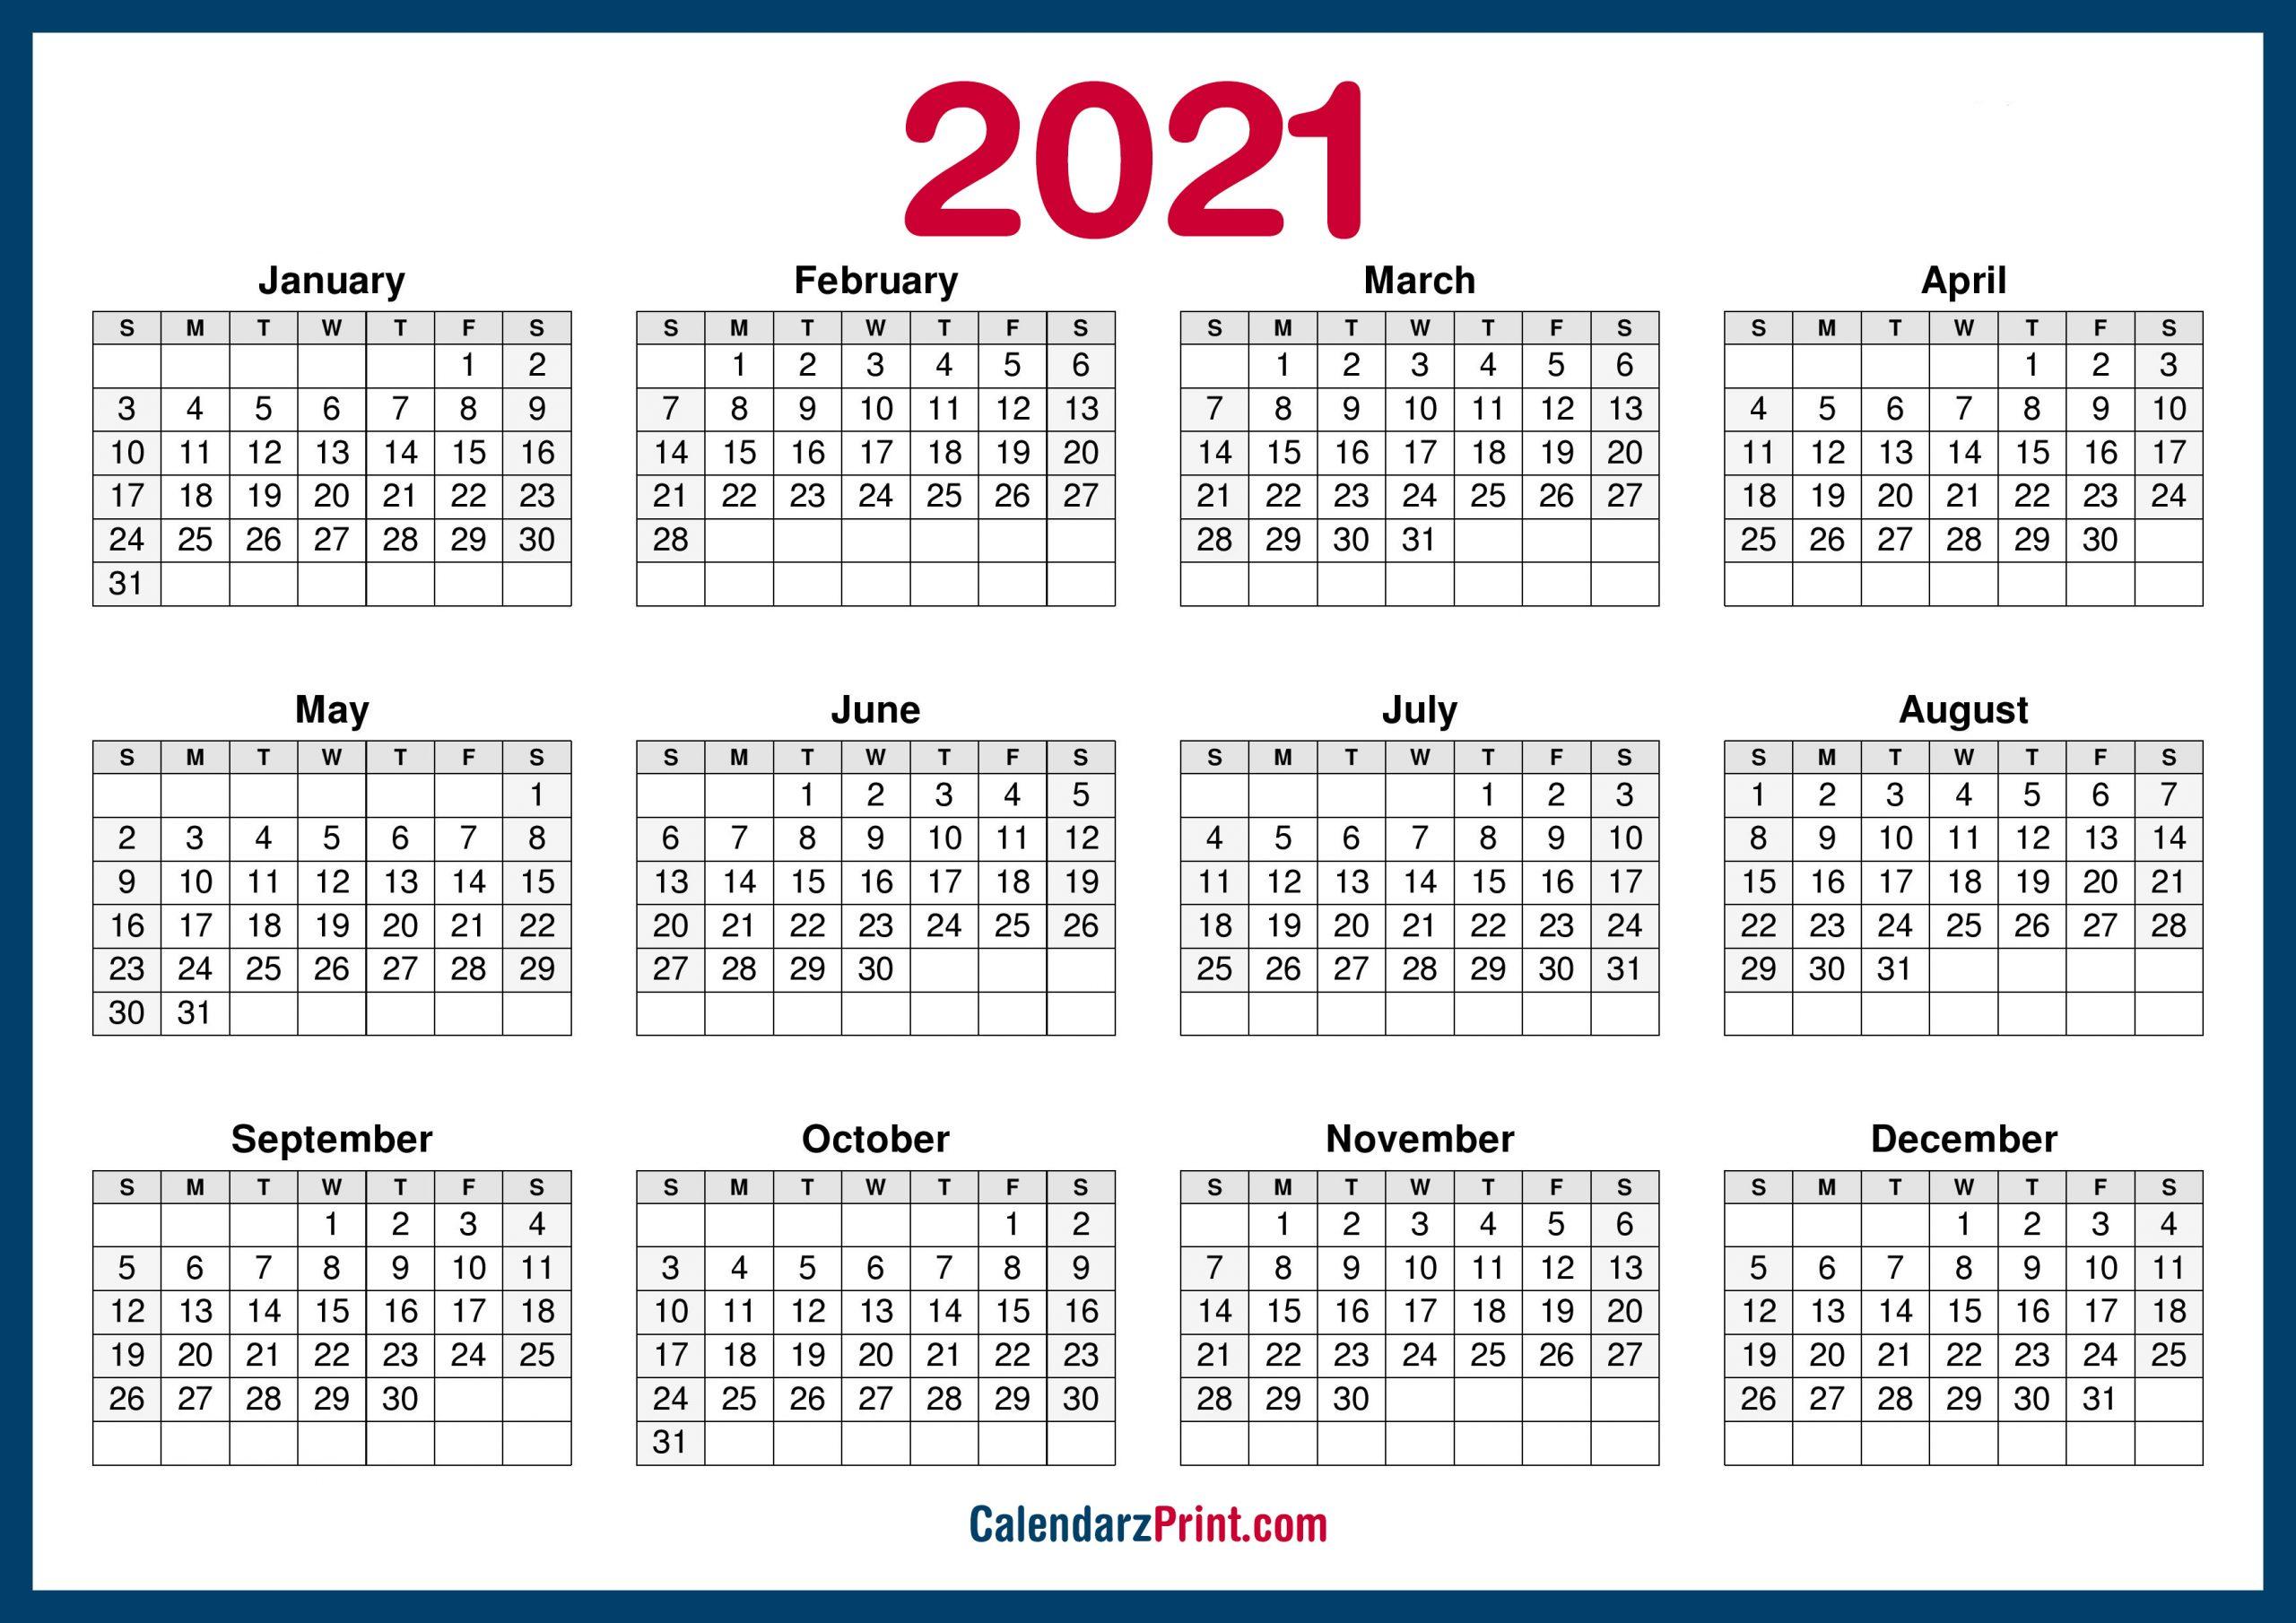 2021 Calendar Printable Free Horizontal Hd Navy Blue